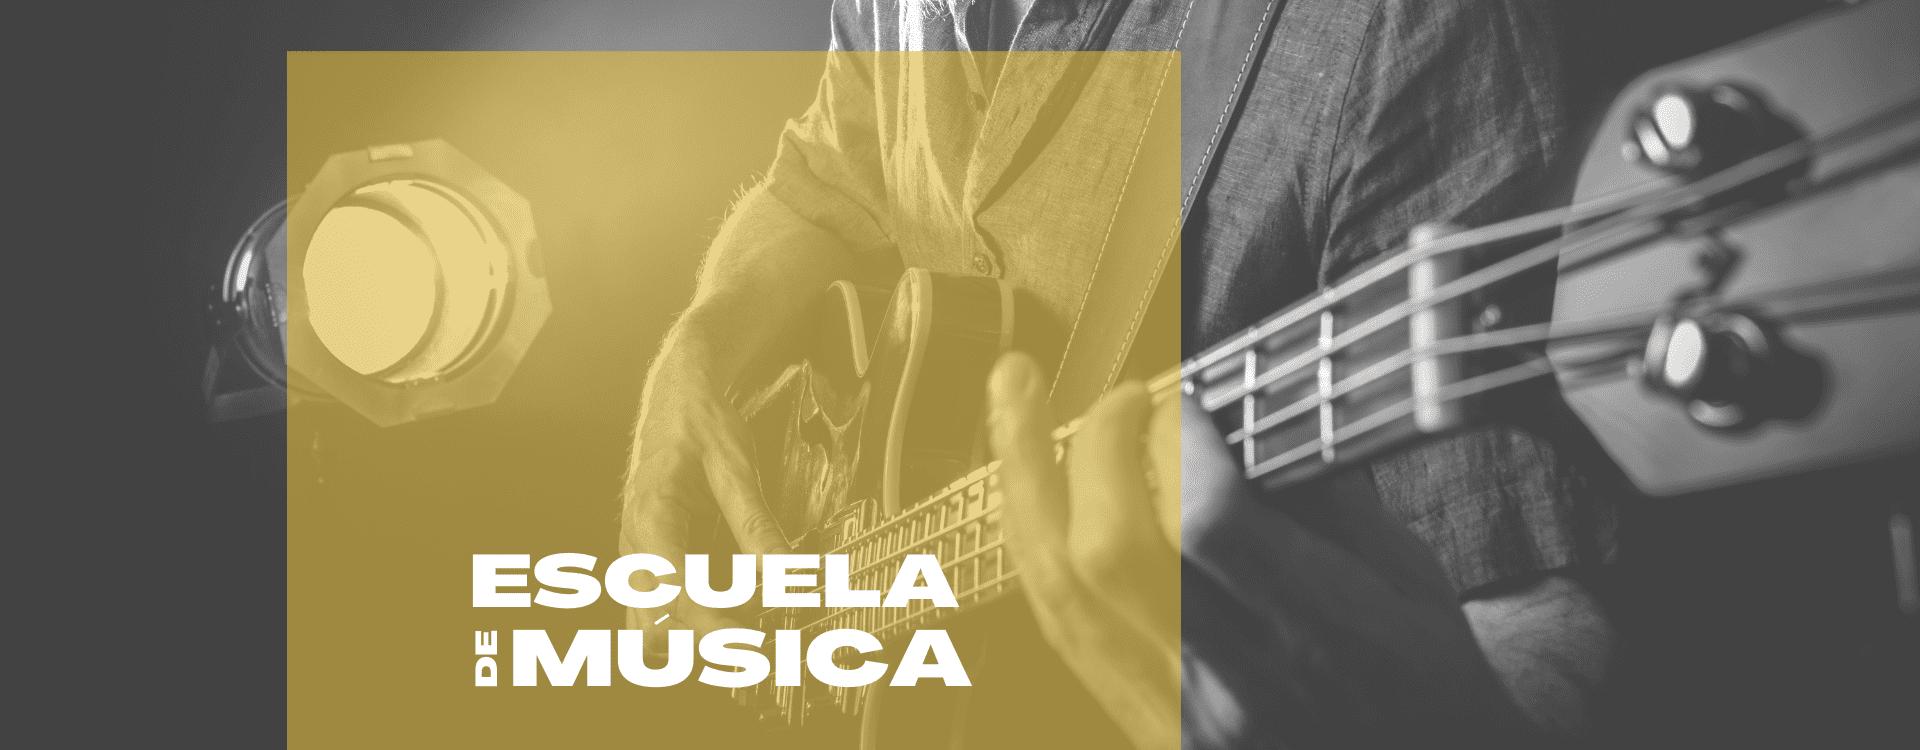 Escuela de Música Aula Joven. Barrio de Prosperidad, Chamartín